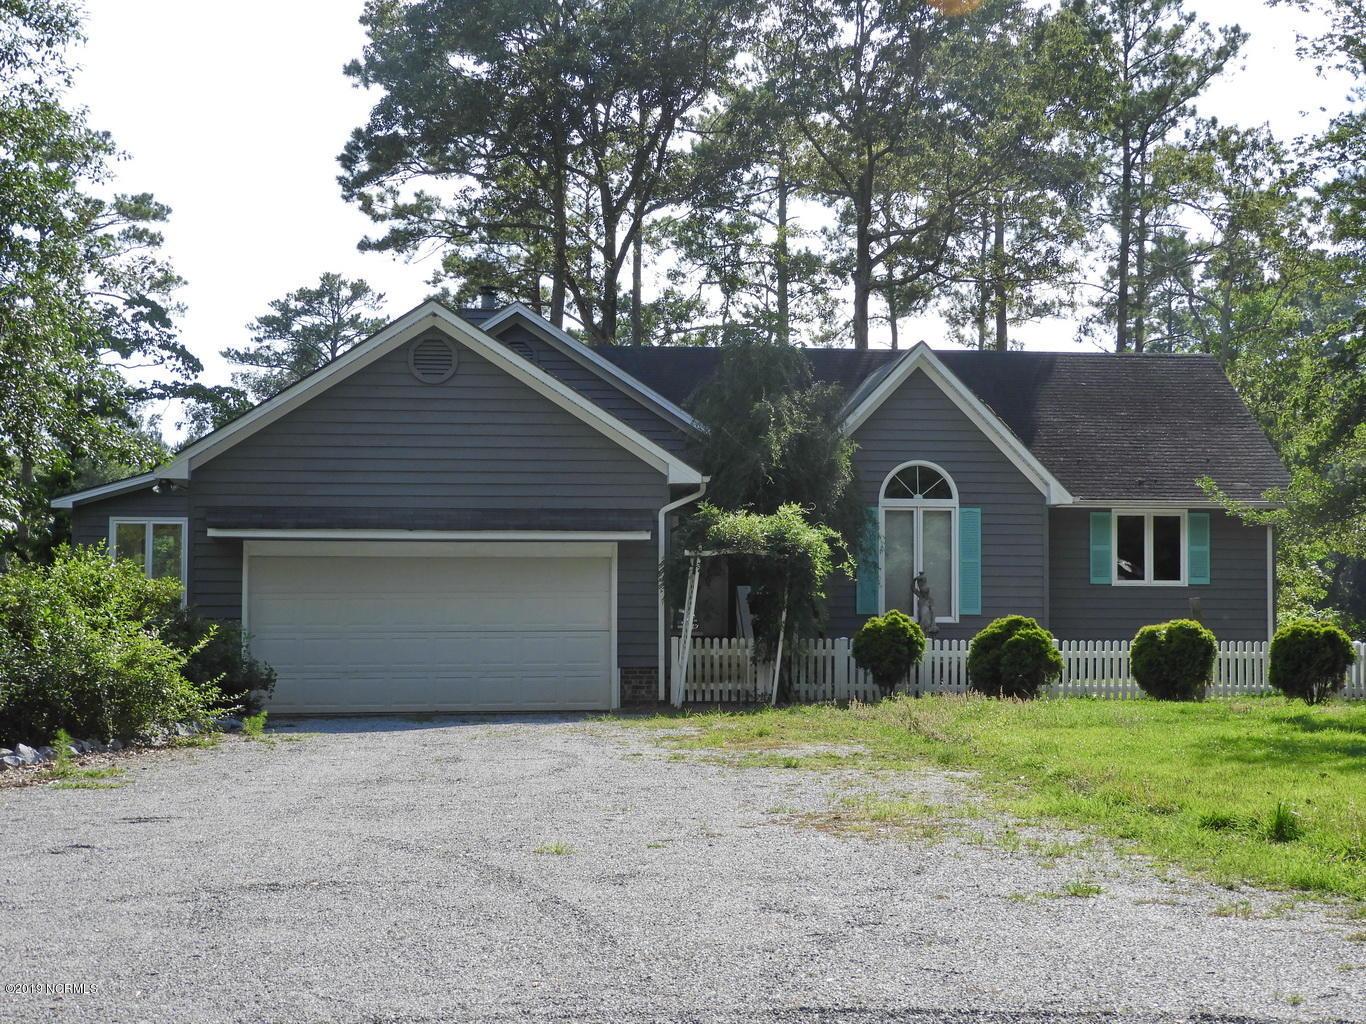 831 Mixon Creek Drive, Bath, North Carolina 27808, 2 Bedrooms Bedrooms, 6 Rooms Rooms,2 BathroomsBathrooms,Single family residence,For sale,Mixon Creek,100177294